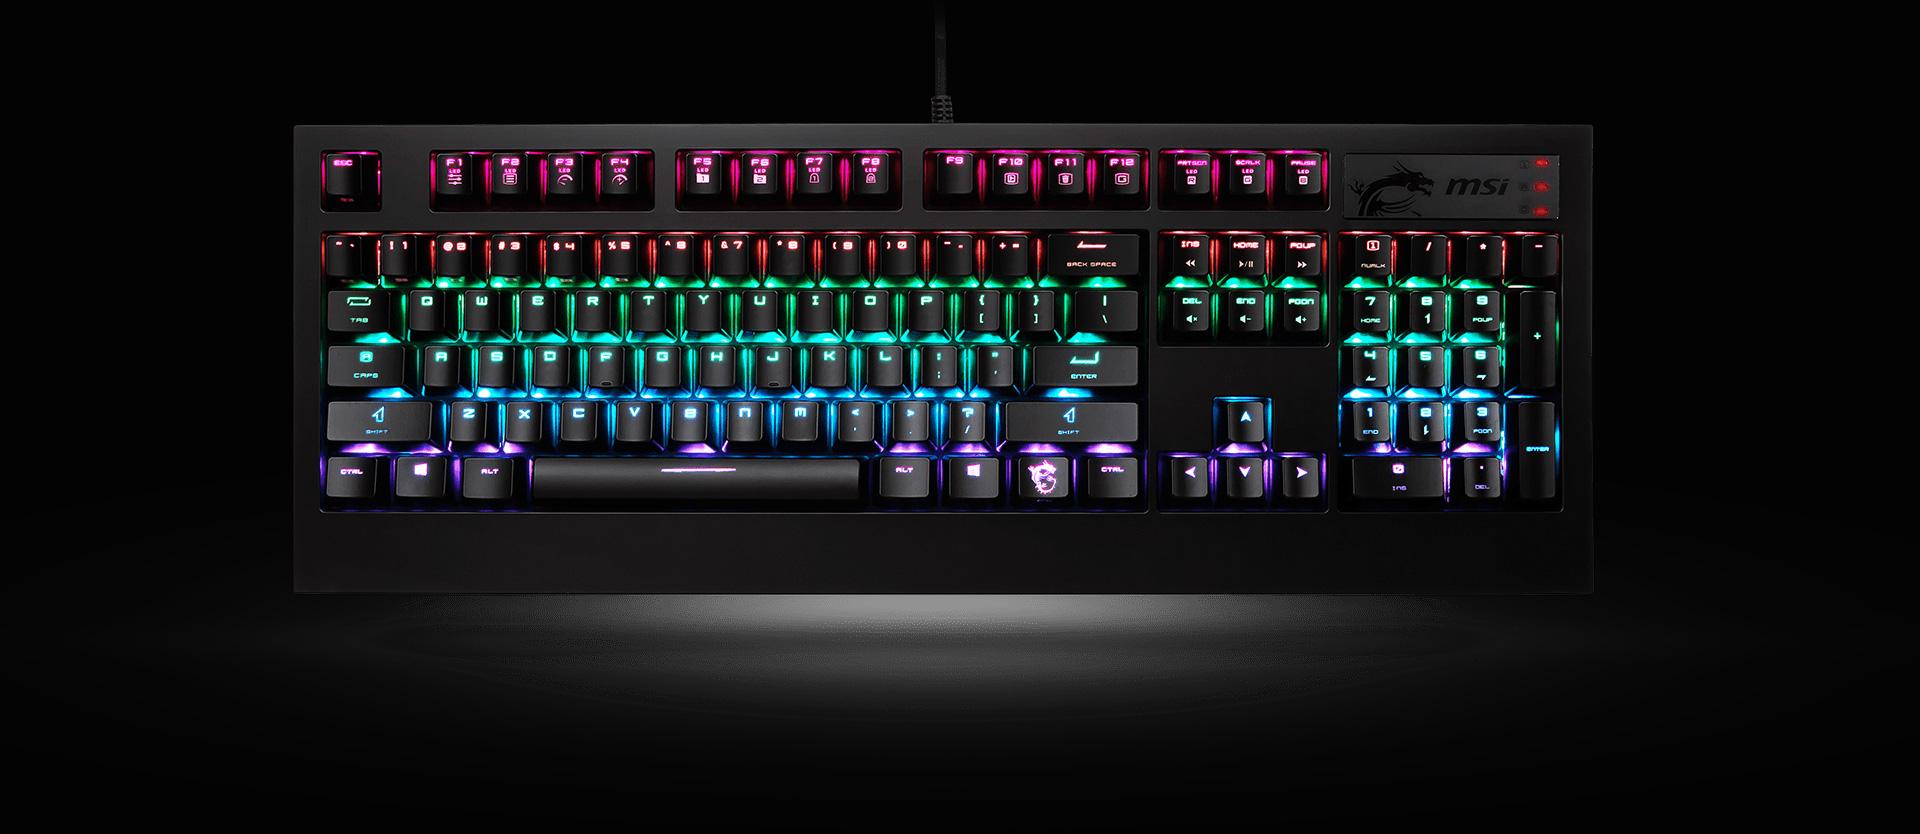 bc980c8e15d MSI GK-701 RGB Gaming Keyboard with Cherry MX SPEED RGB Silver ...